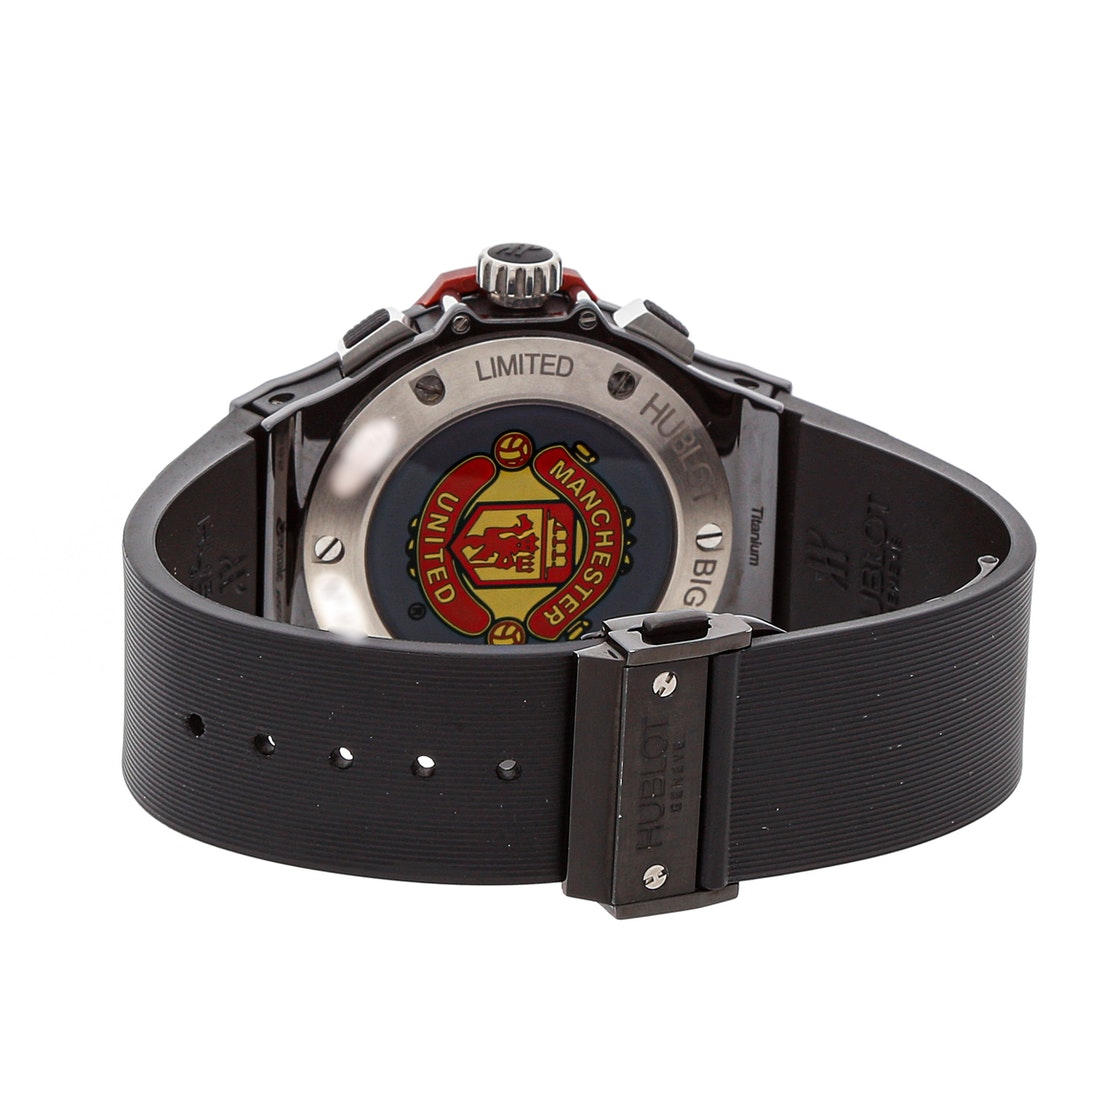 Hublot Big Bang King Red Devil Bang Limited Edition 318.CM.1190.RX.MAN08